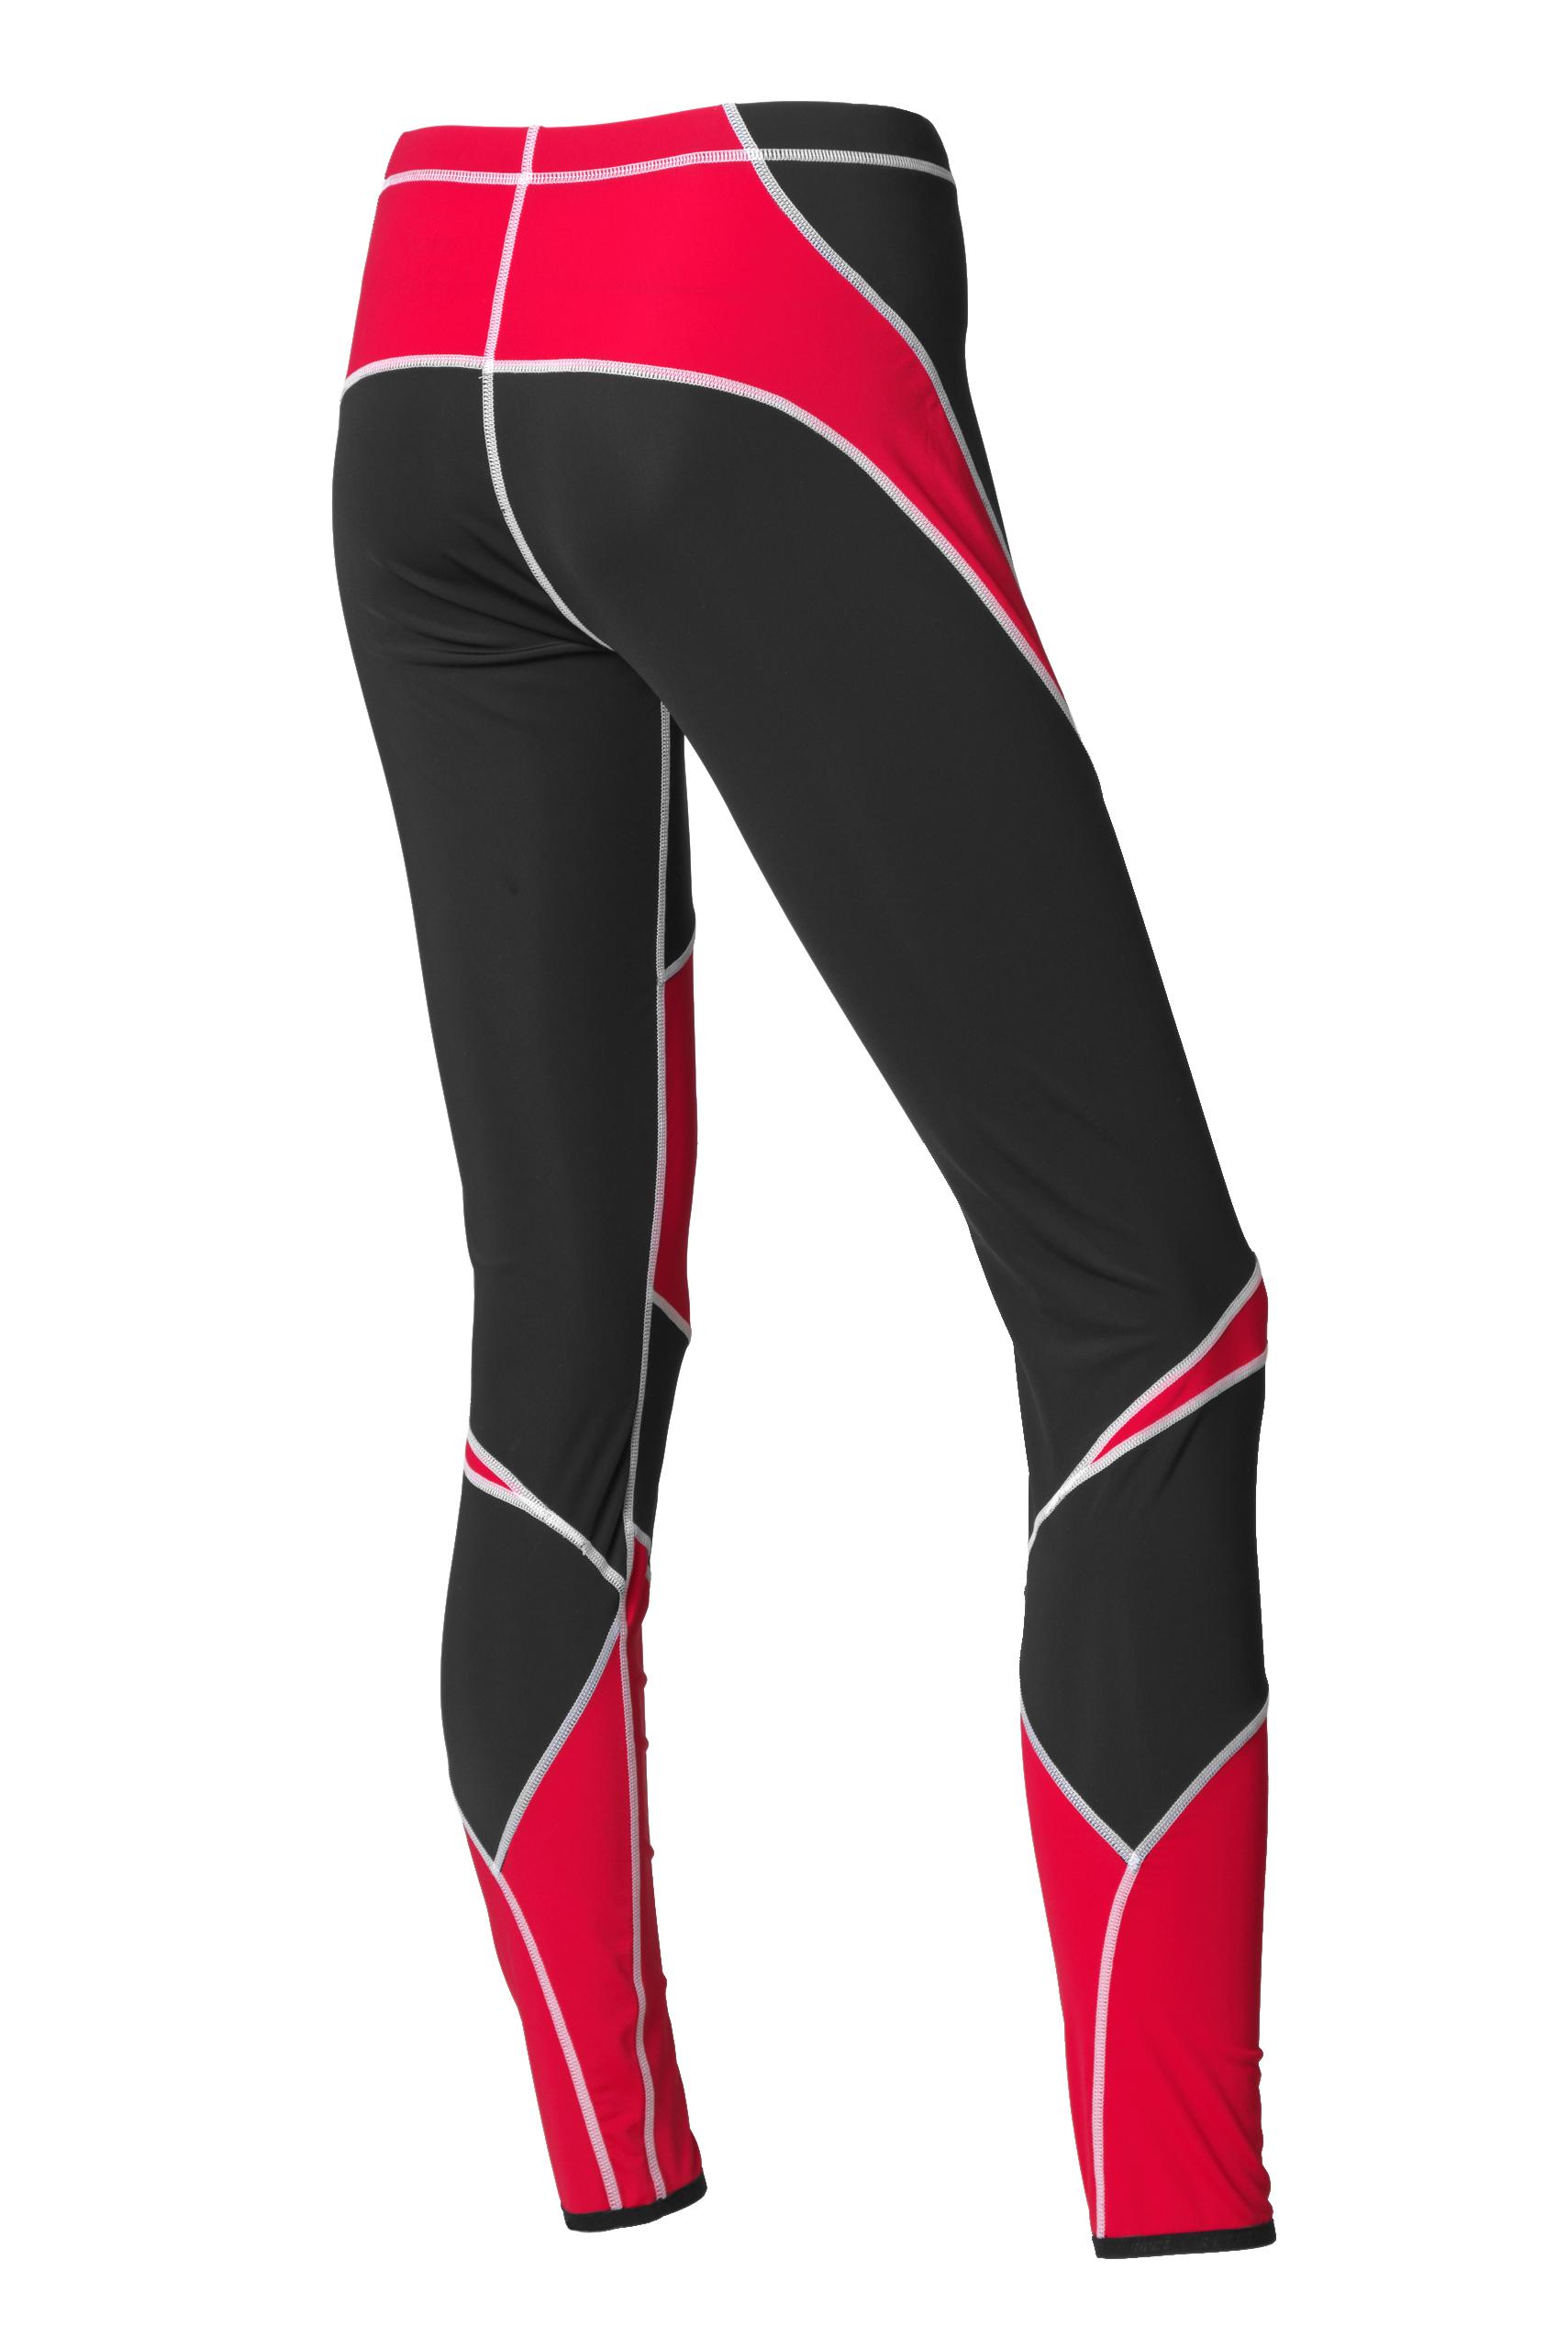 LAHTI TWO PIECES SUIT UNISEX (black/red)